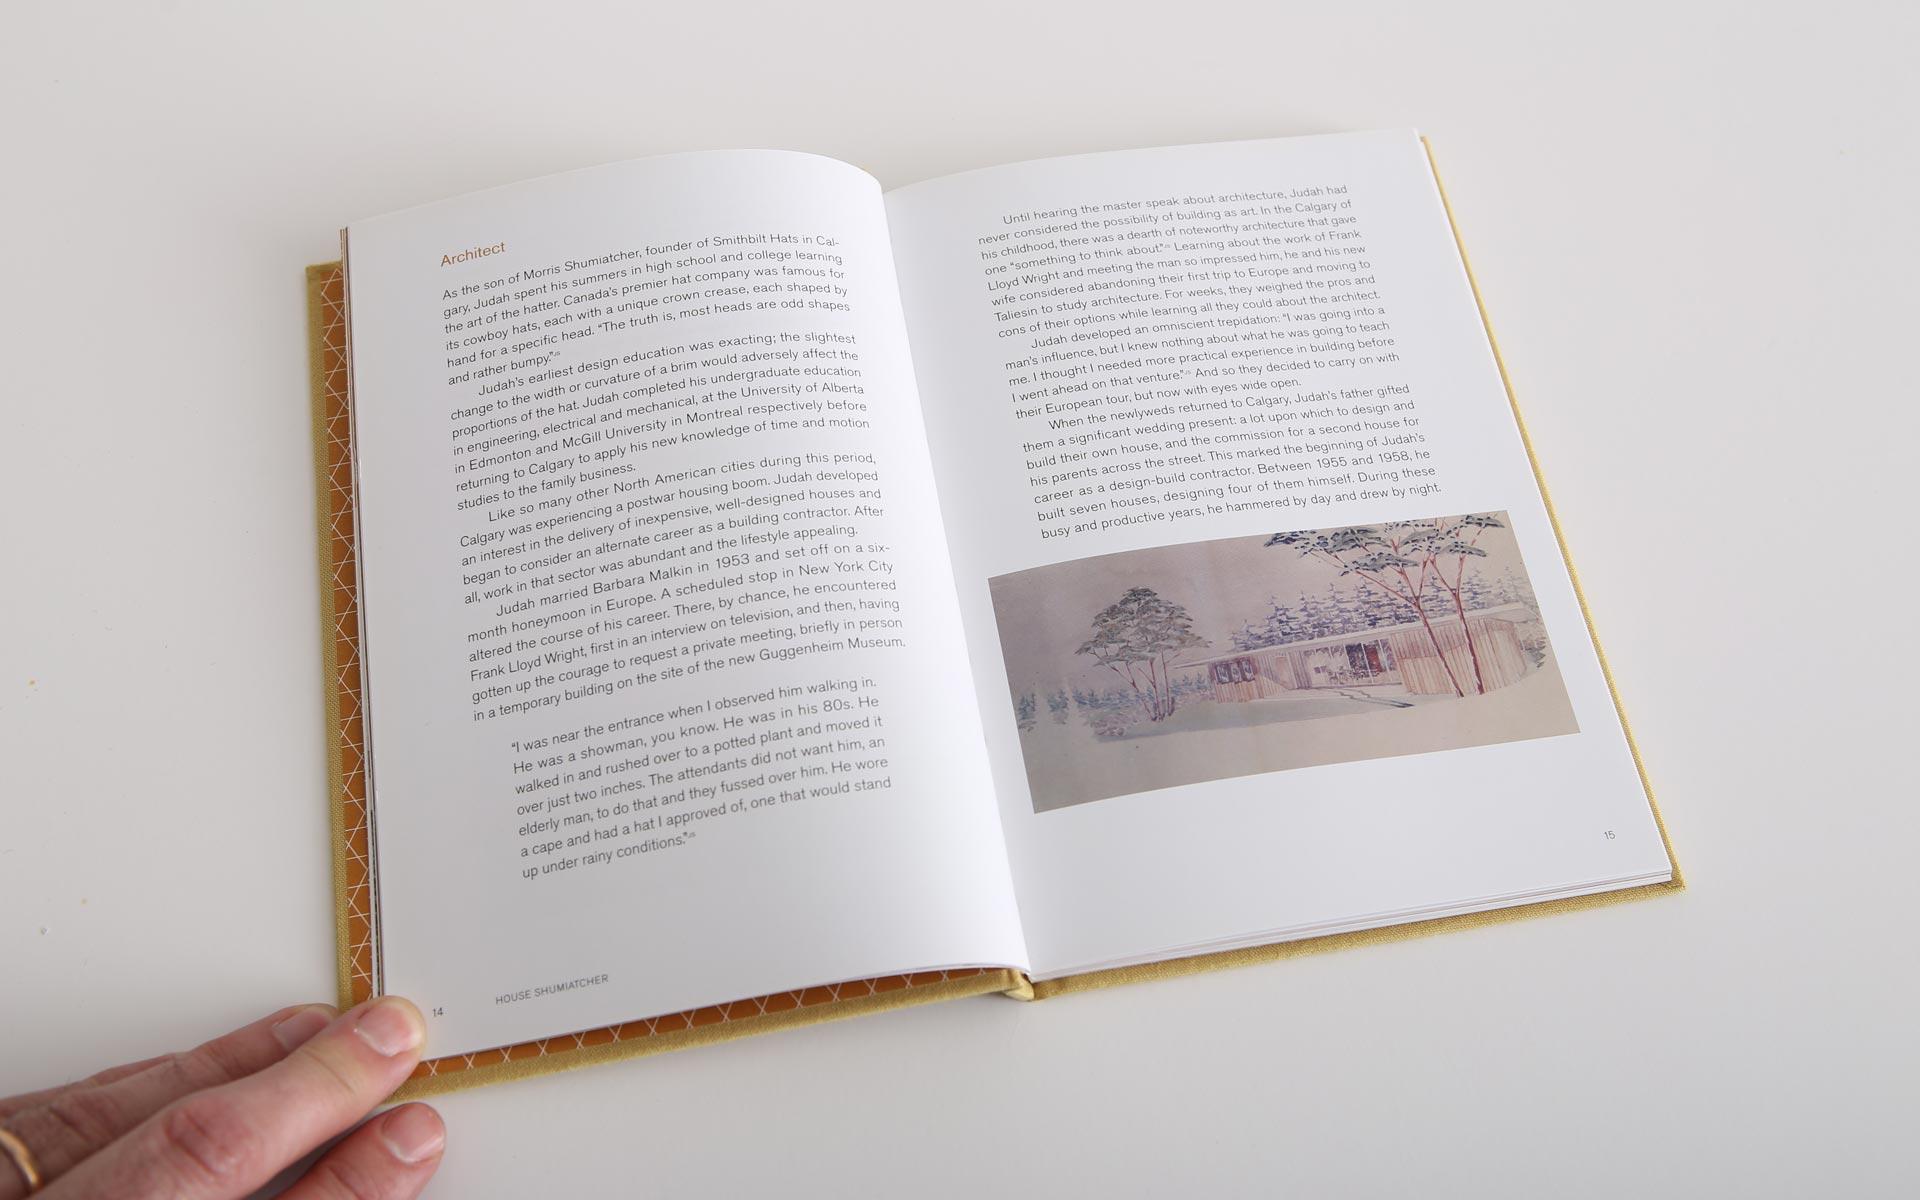 shumiatcher-ubc-sala-book-design-5